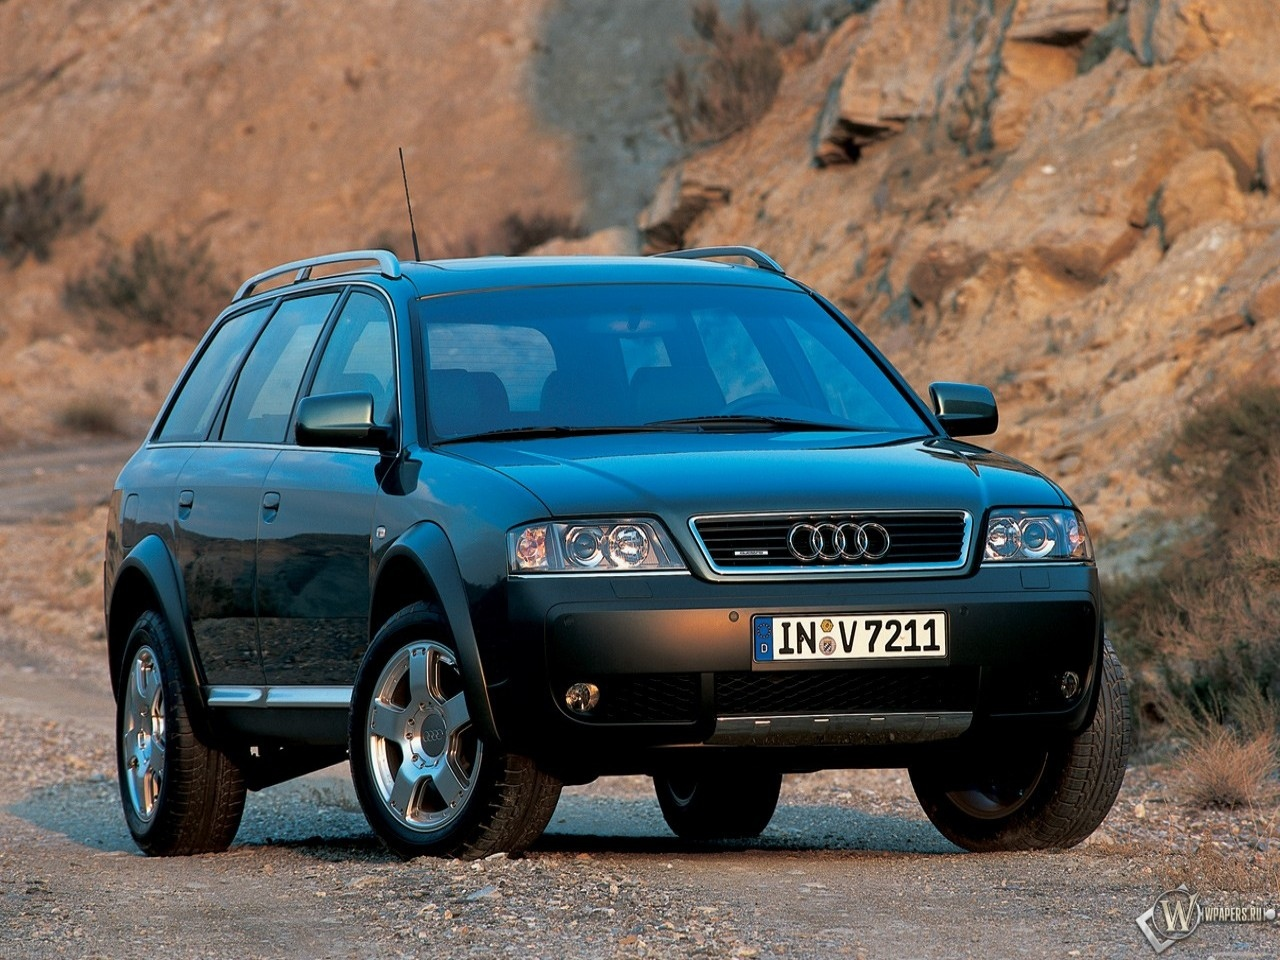 Скачать обои Ауди Allroad (2000) (Audi Allroad) для ...: http://wpapers.ru/wallpapers/avto/audi/2421/1280-960_Ауди-allroad-(2000).html